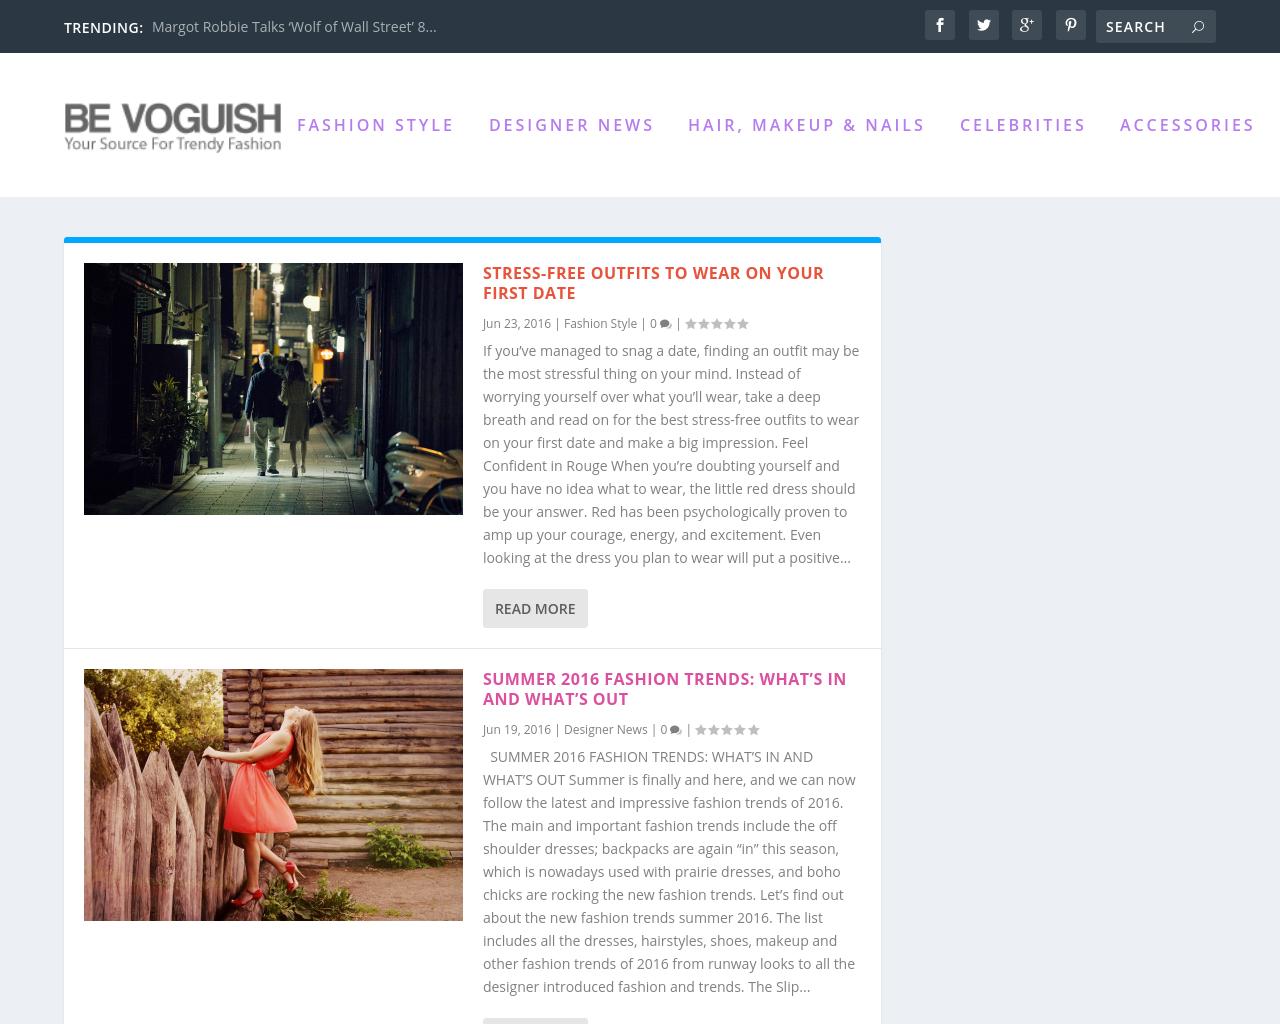 Be-Voguish-Advertising-Reviews-Pricing